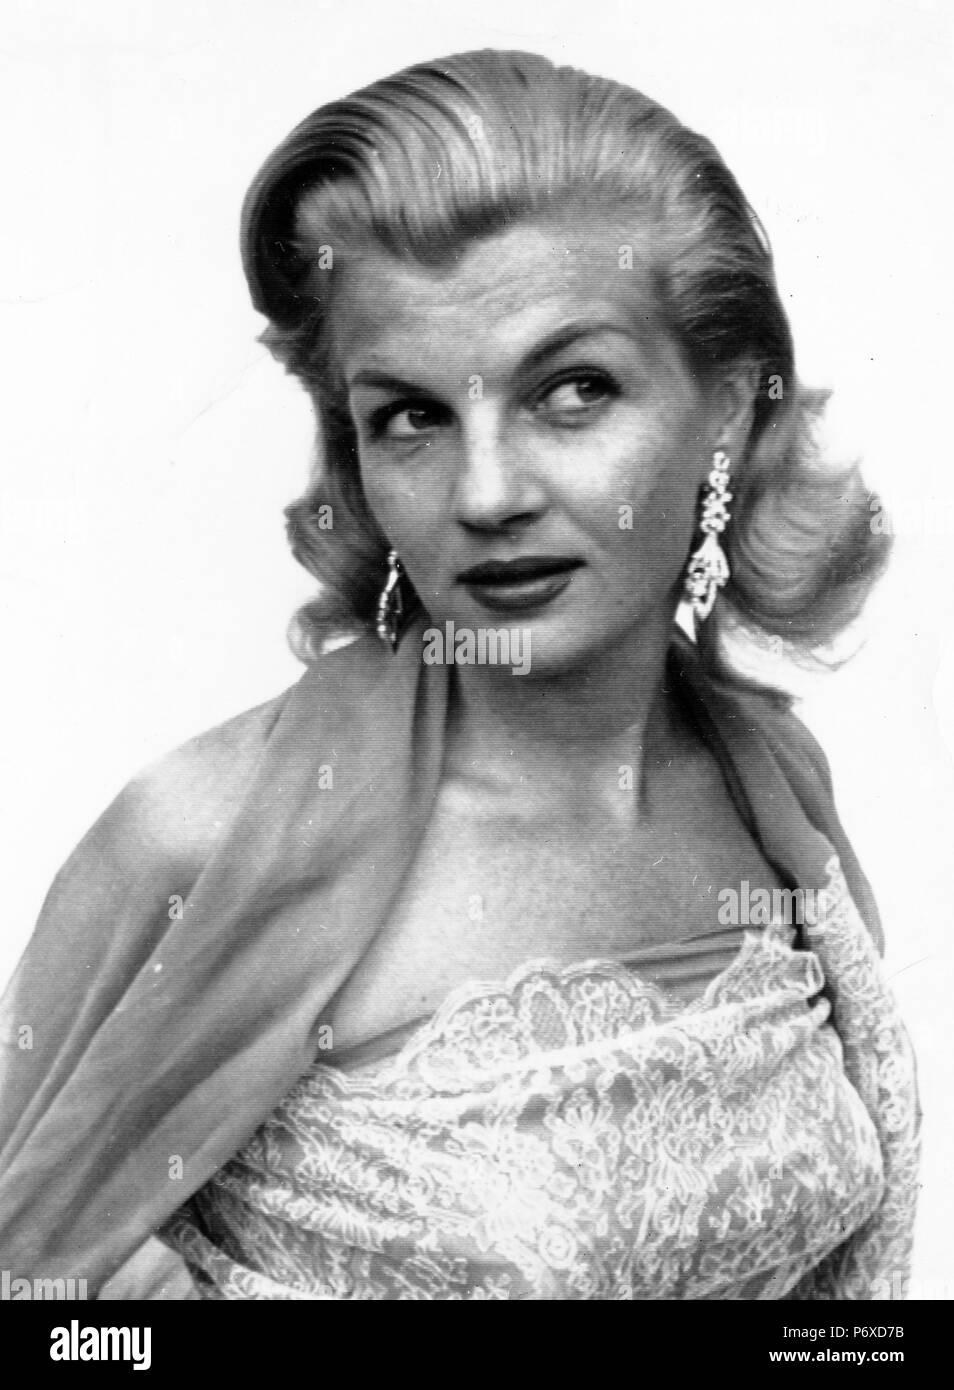 corinne calvet, 1956 - Stock Image